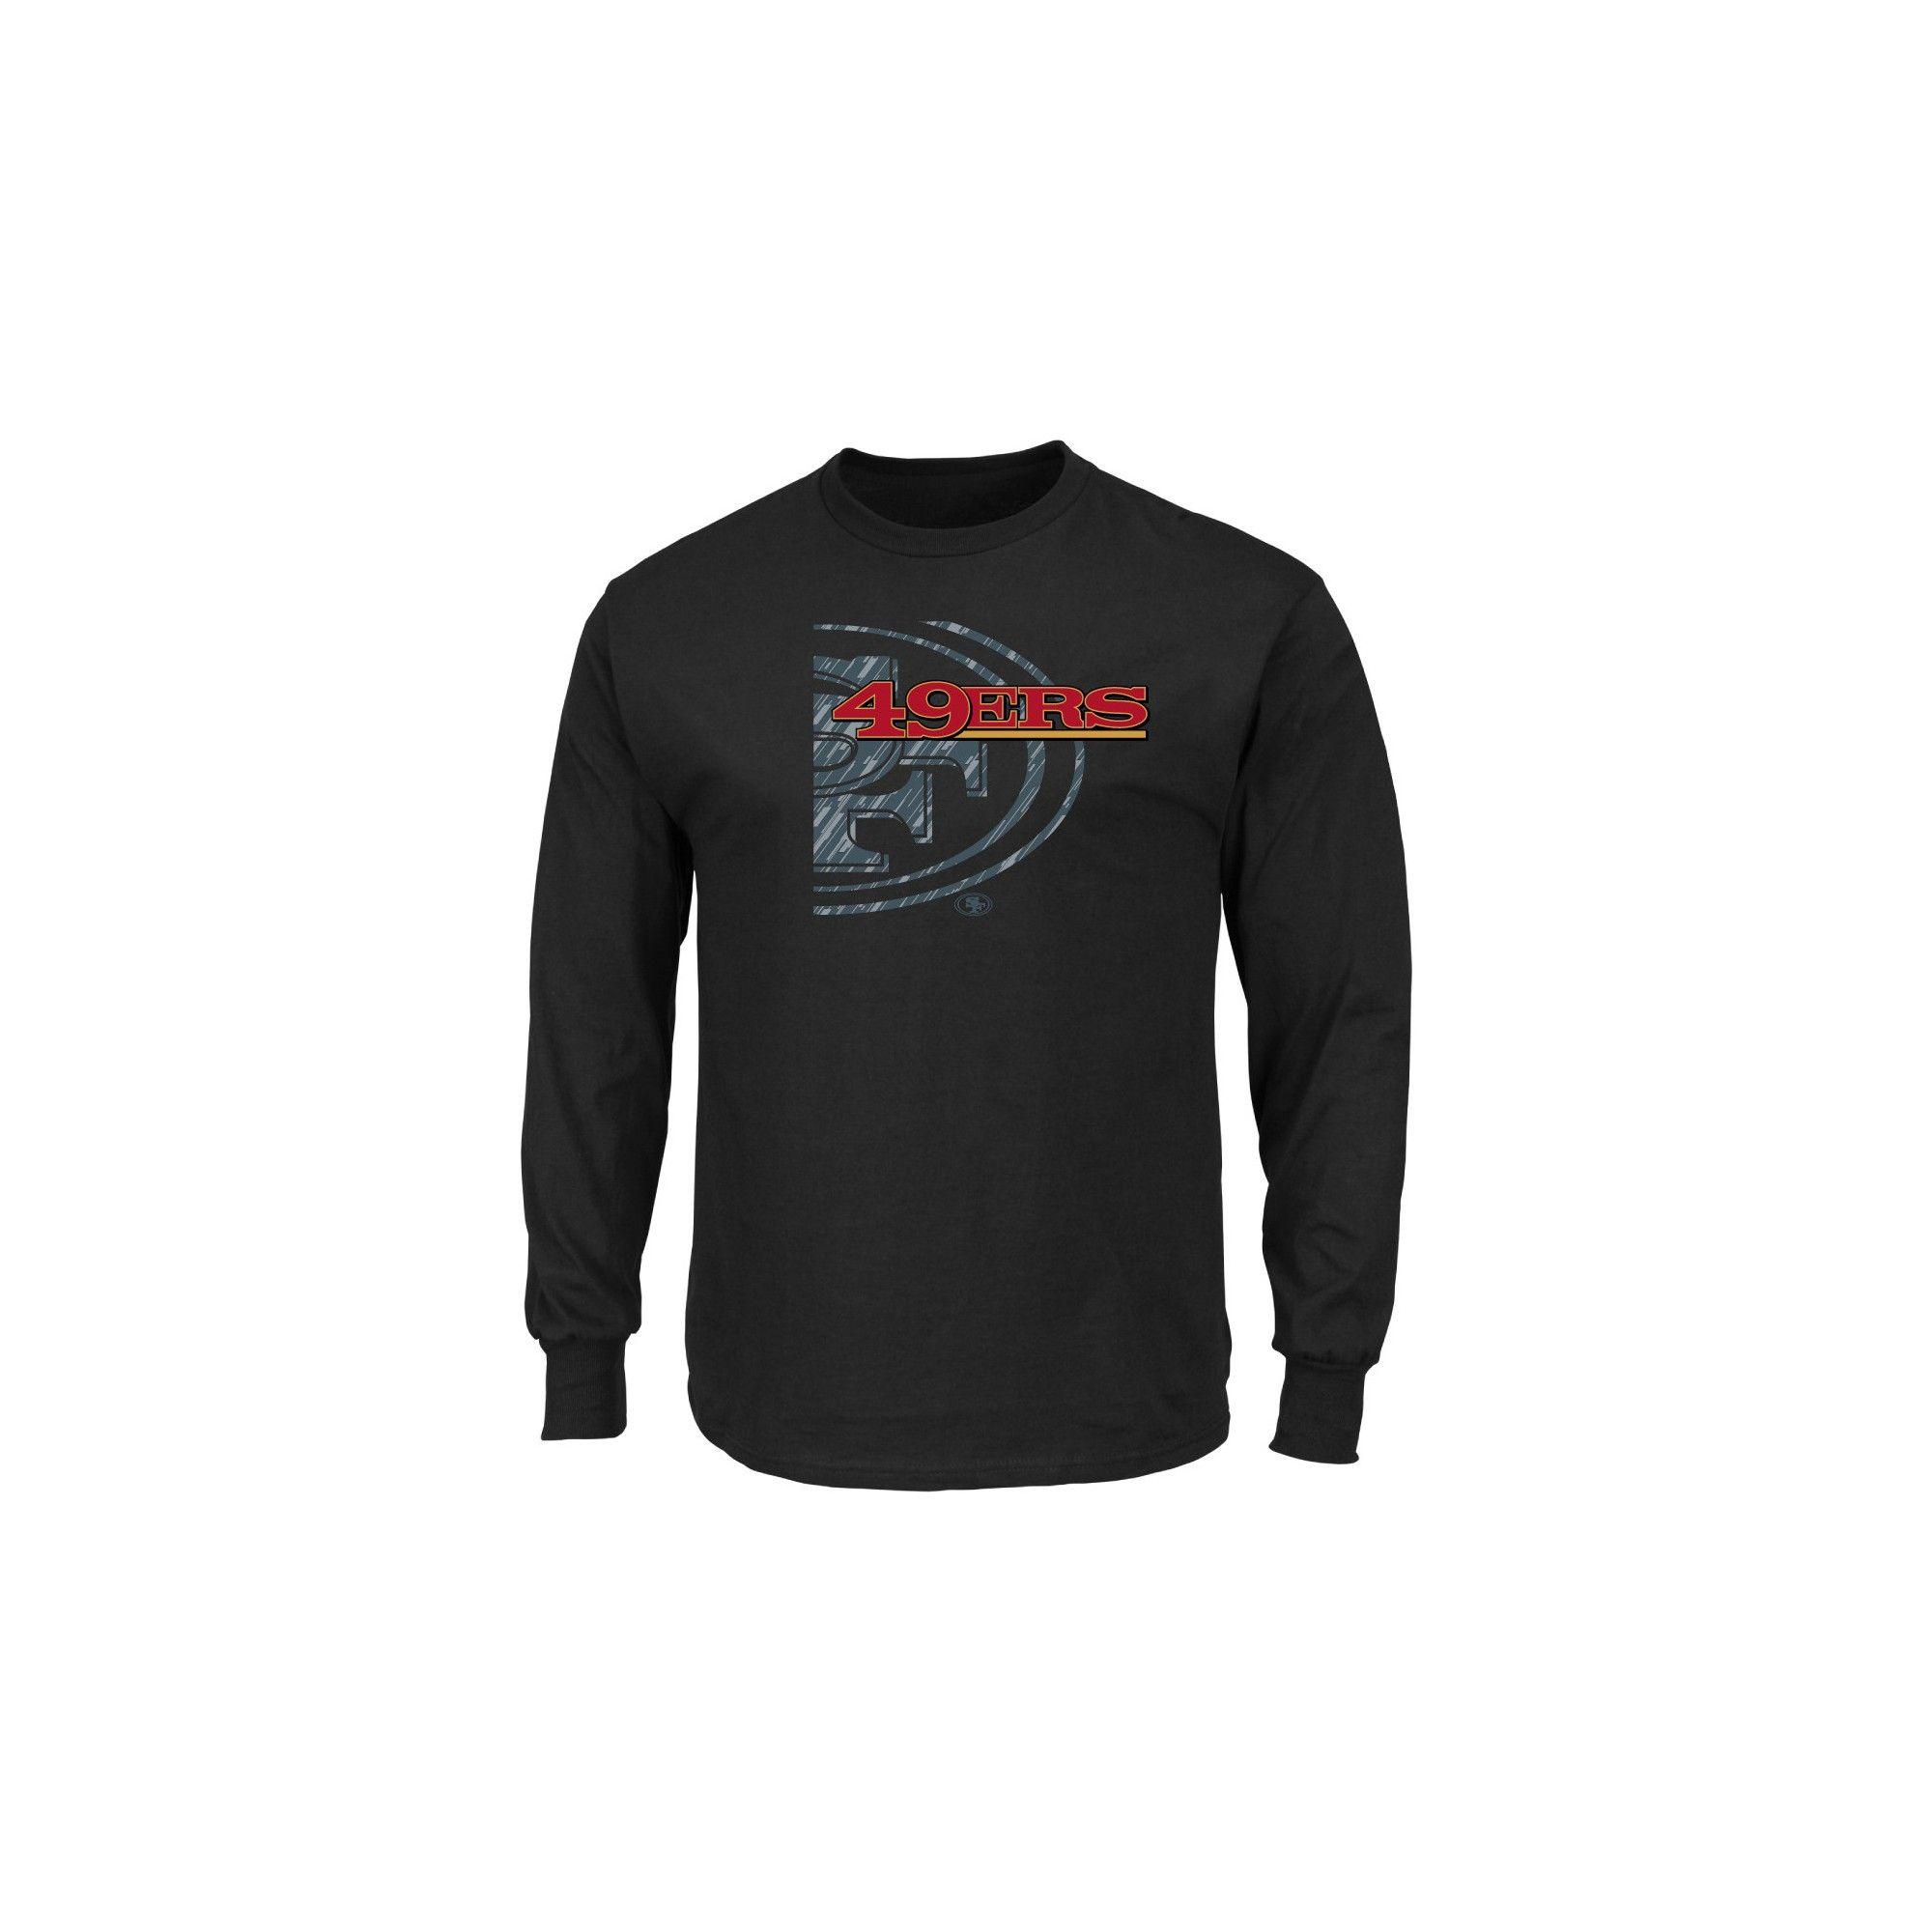 San Francisco 49ers Men s Point of Attack Black Long Sleeve T-Shirt ... 64d8a4e47